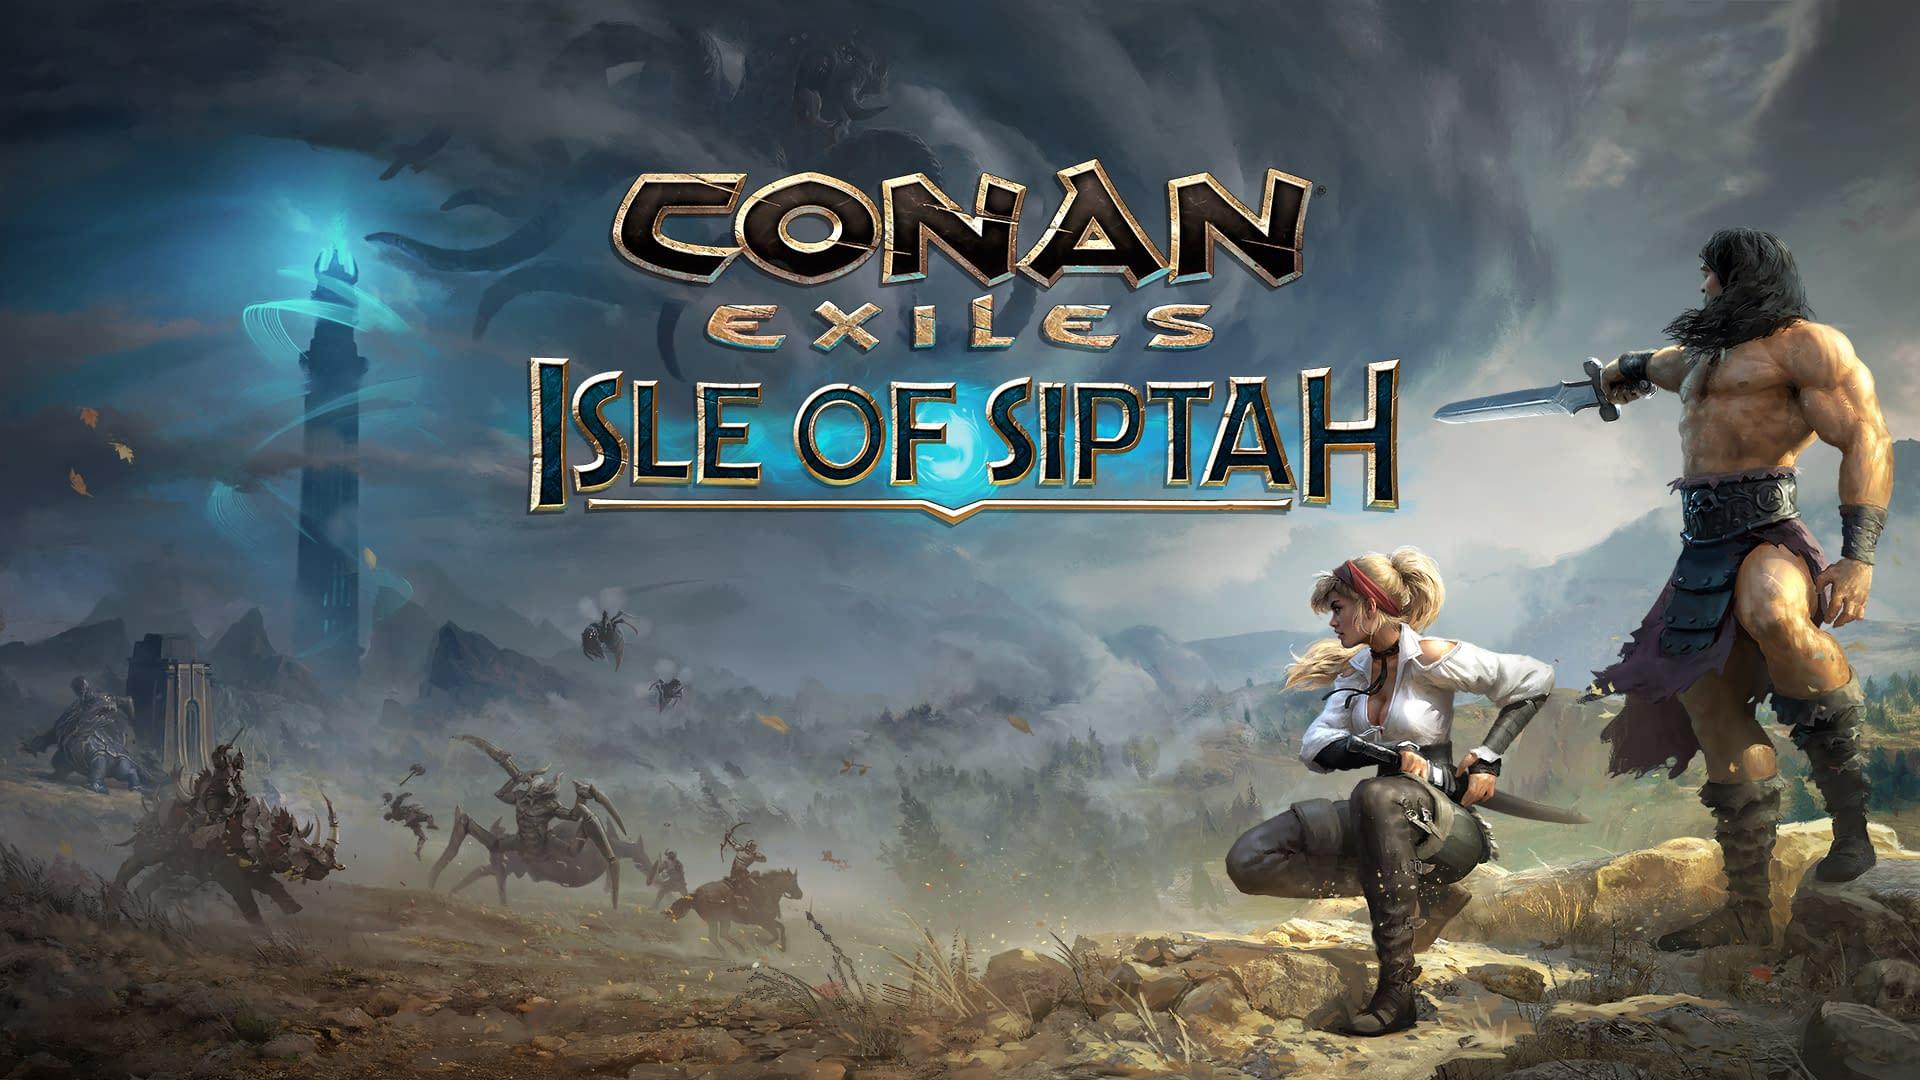 Conan Exiles: The Isle of Siptah